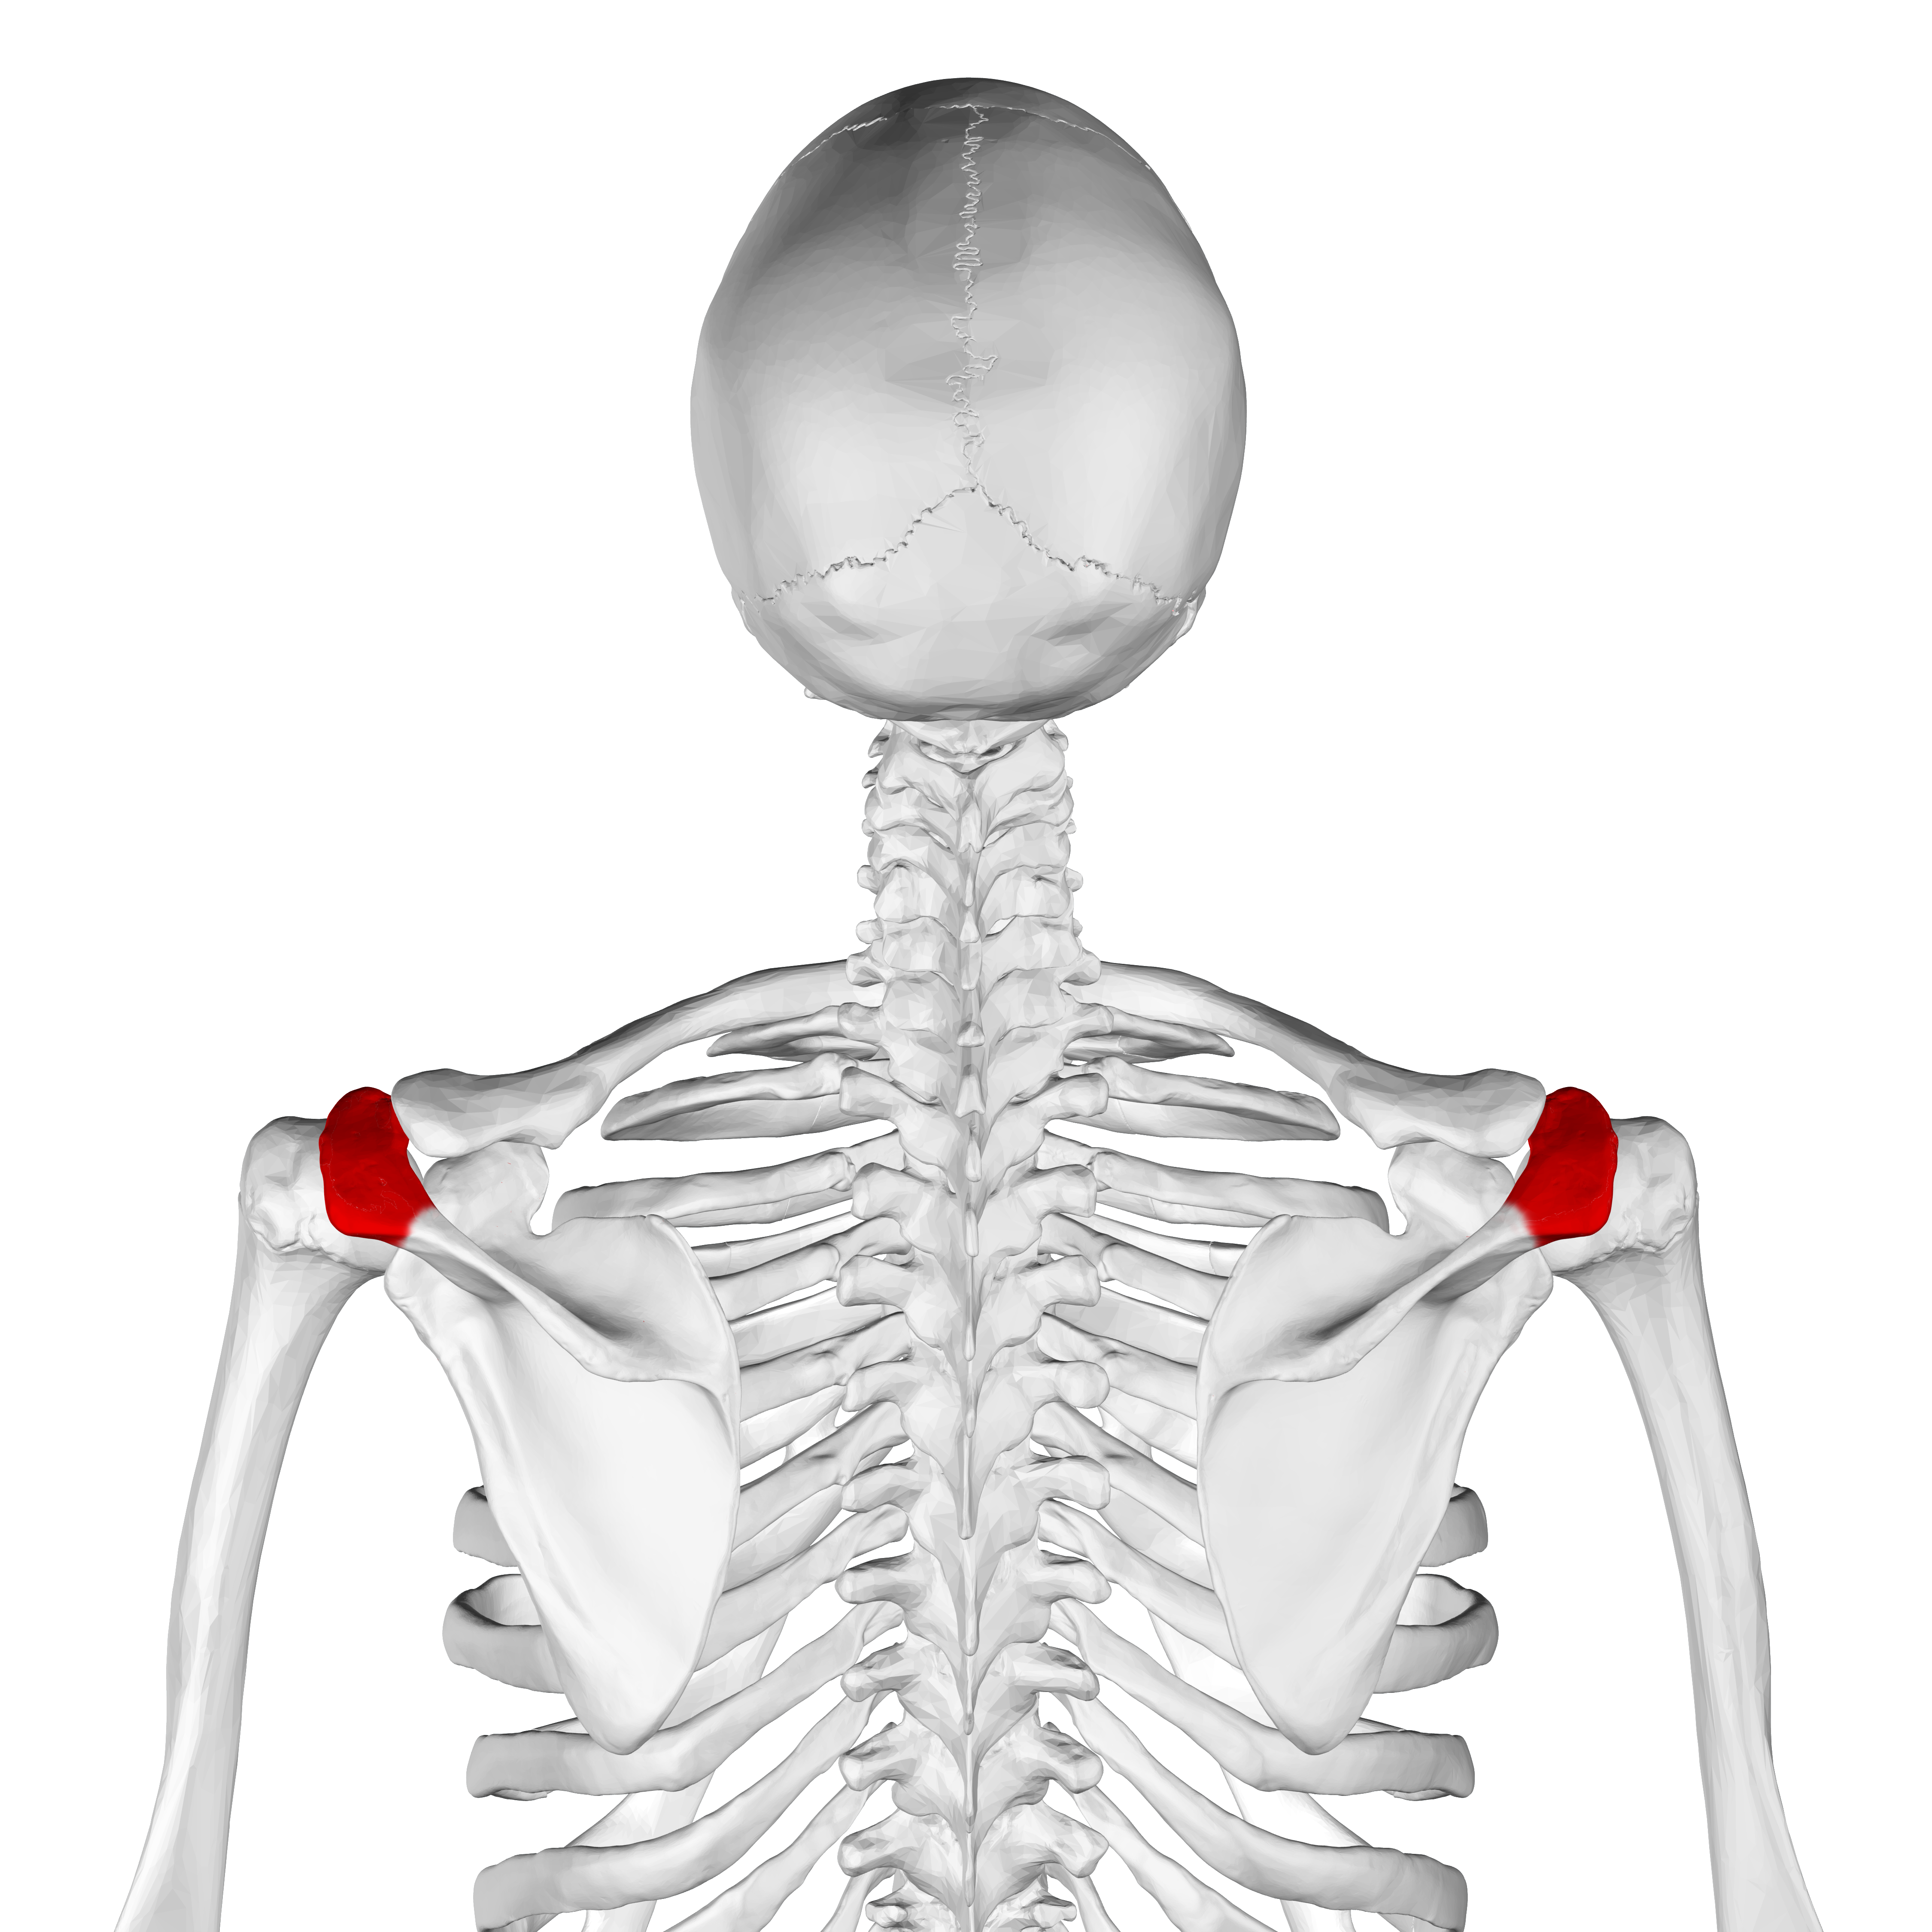 Scapula Spine Coracoid Process Acromion Glenoid Cavit